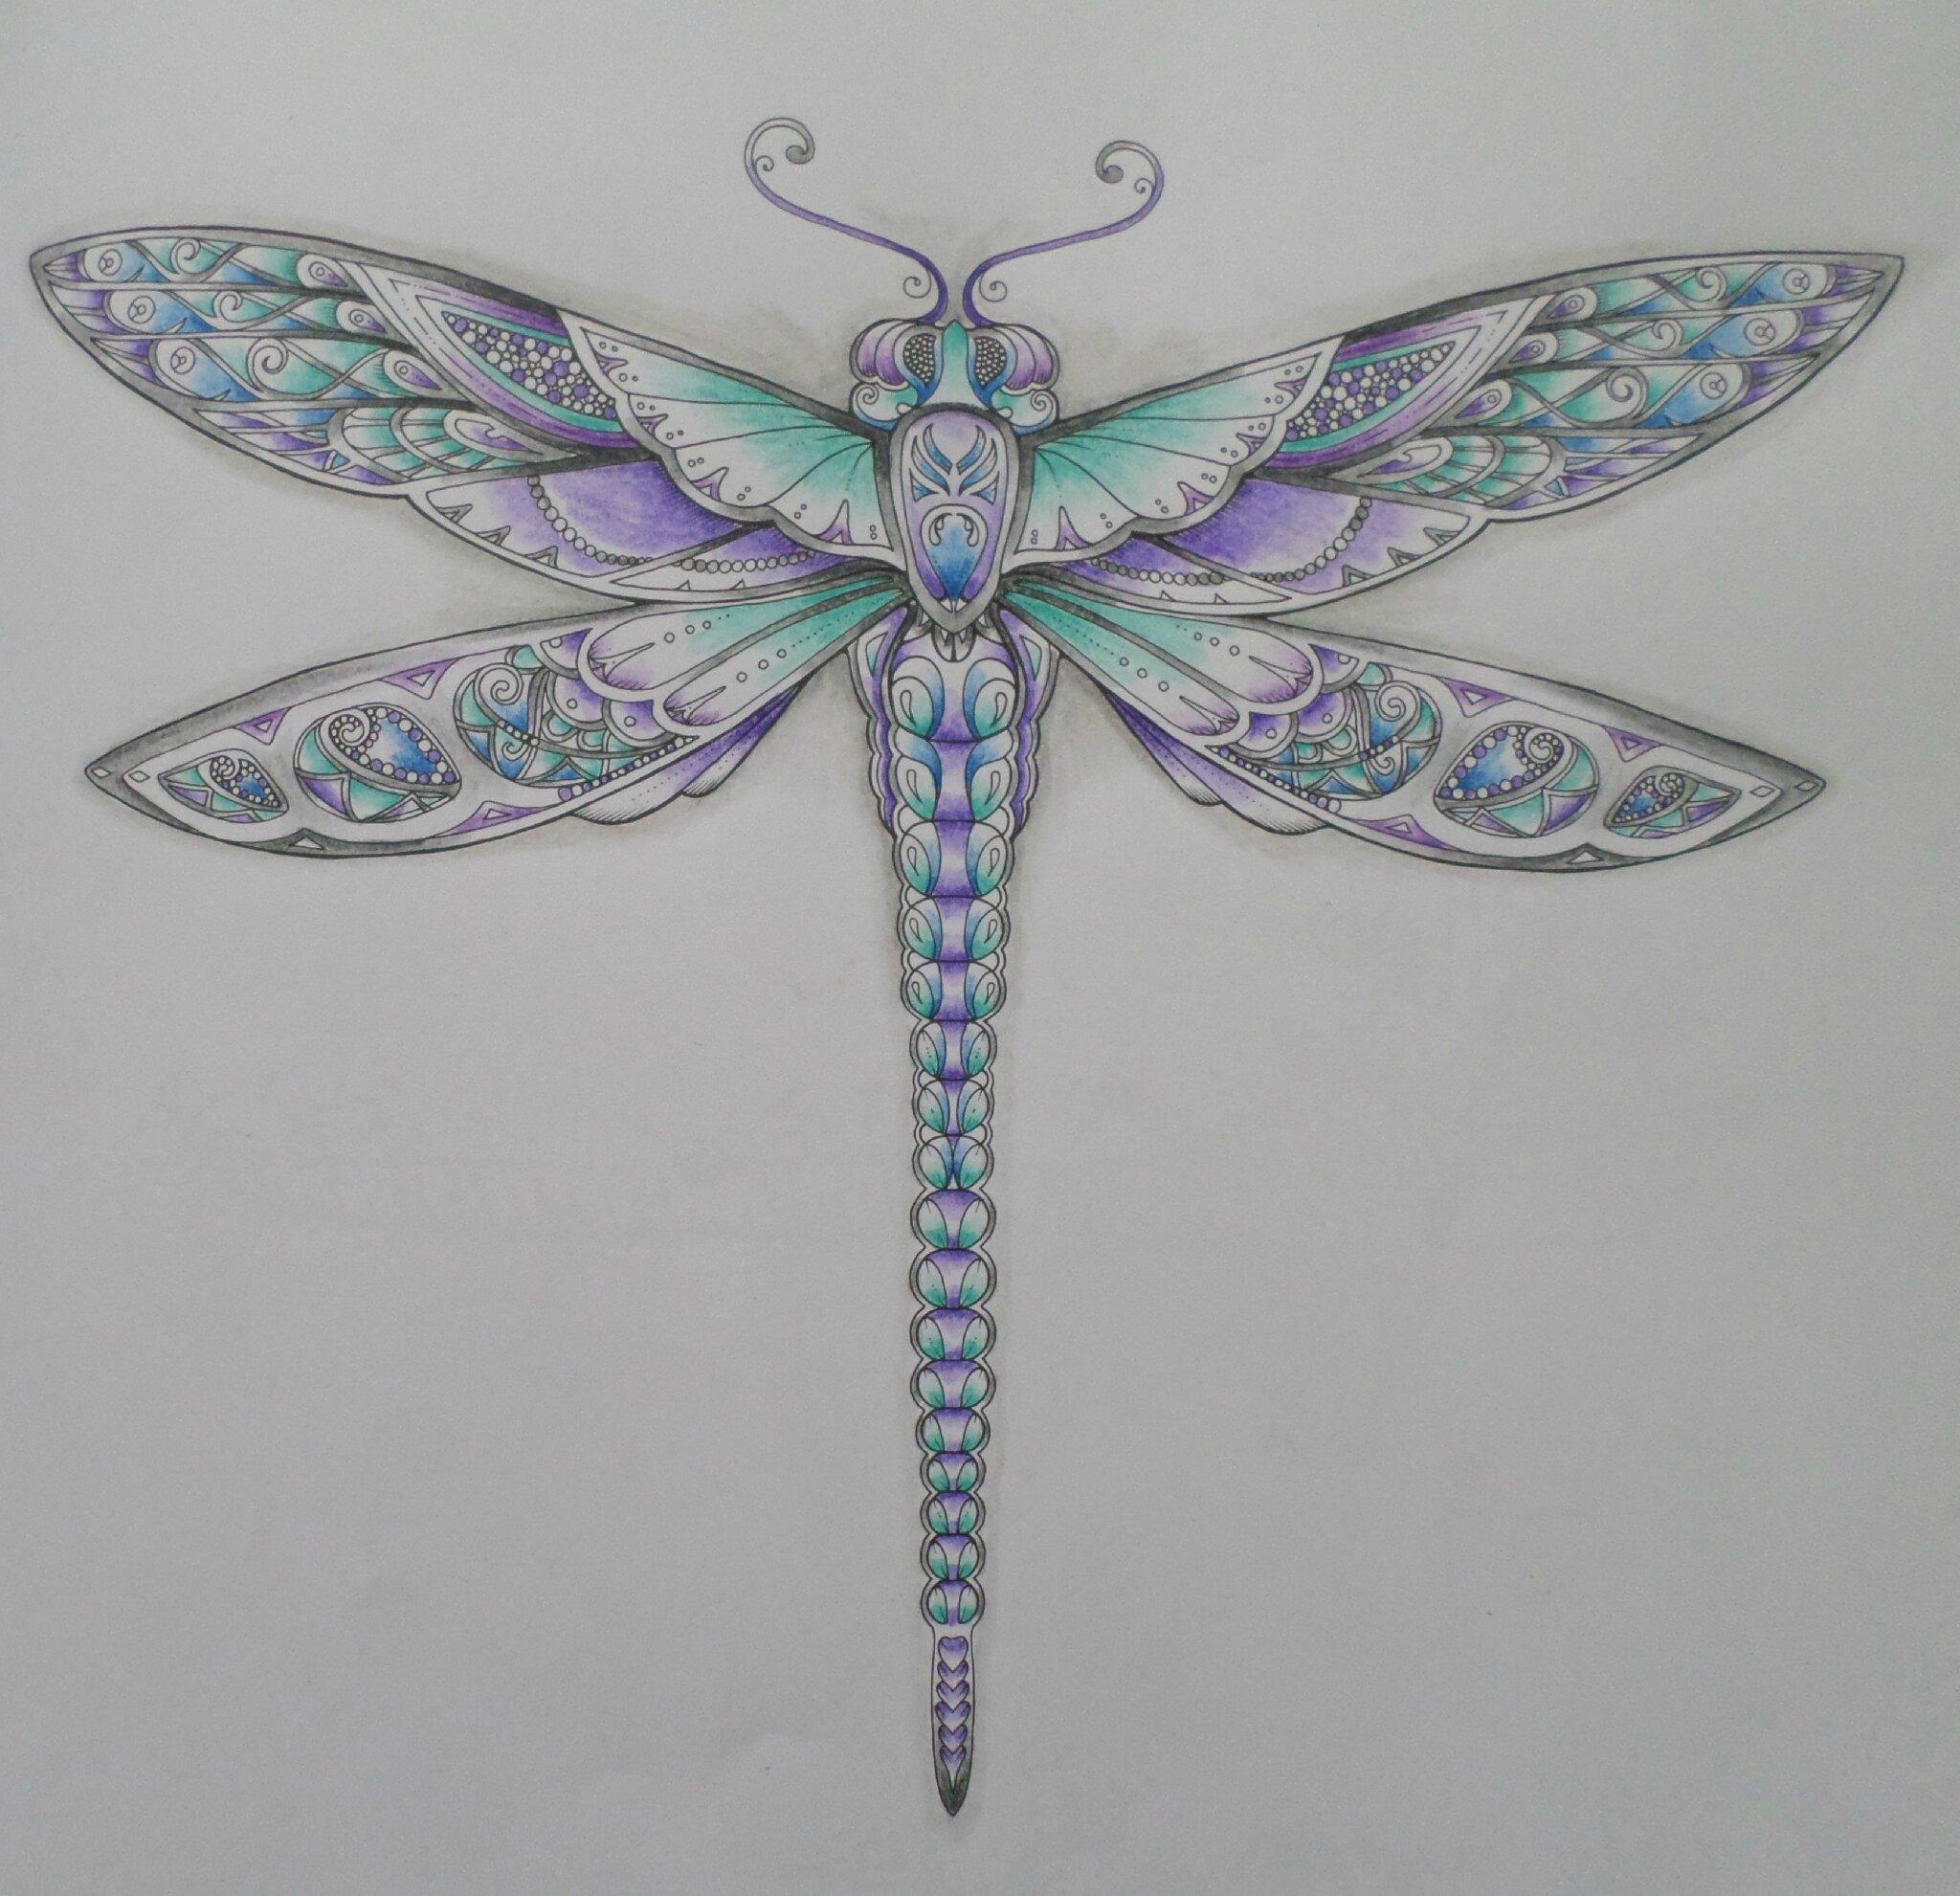 Libellule coloriage steffy elsass cr a - Libellule dessin ...